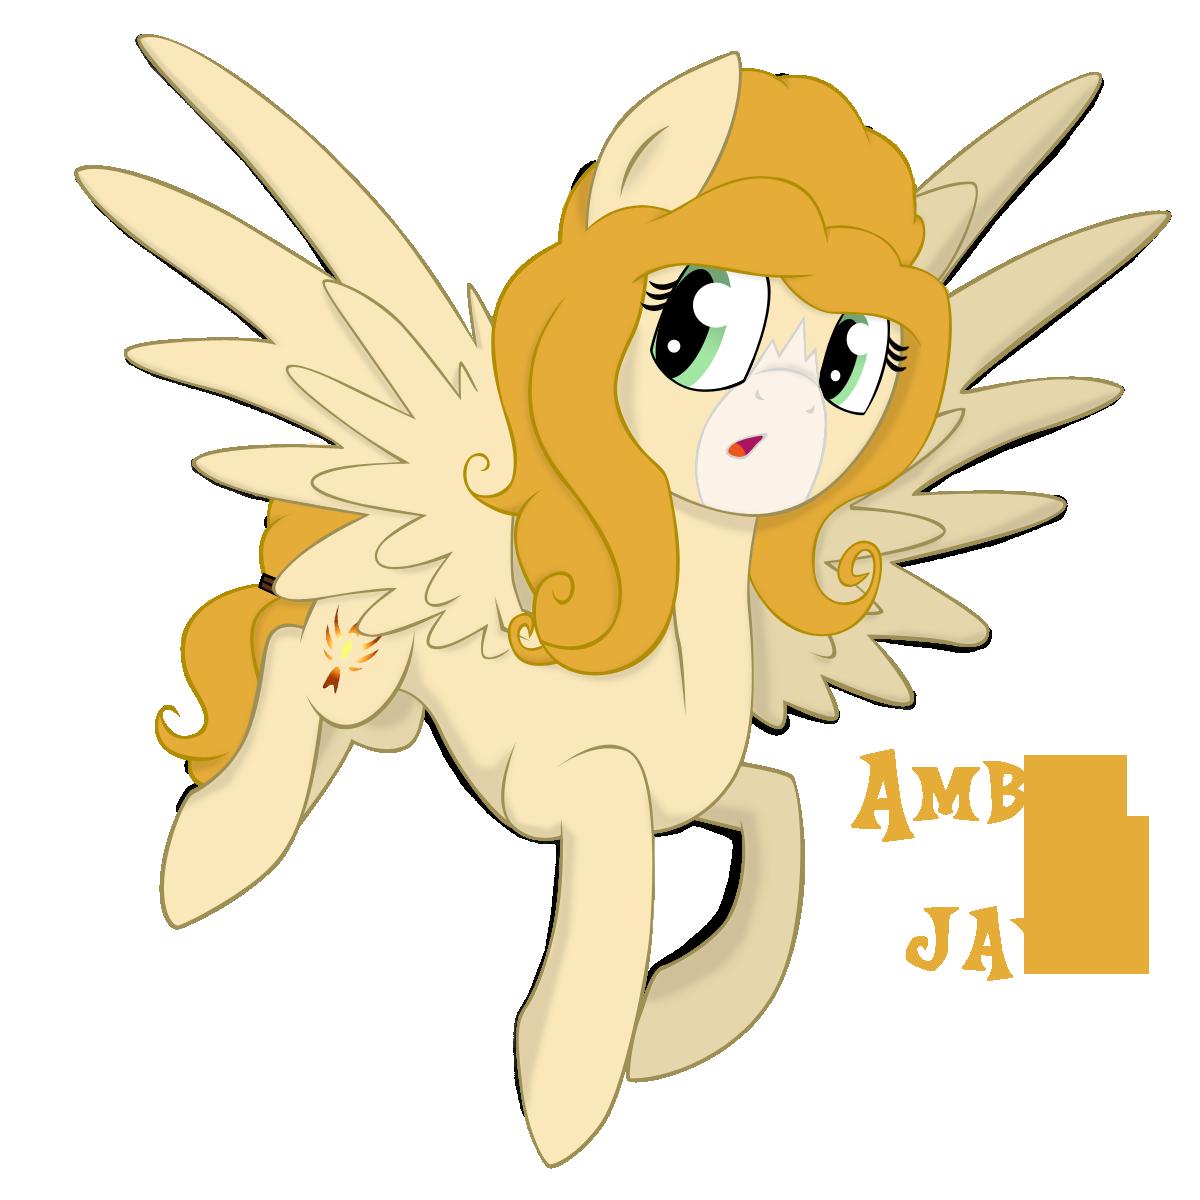 Gift: Amber Jay